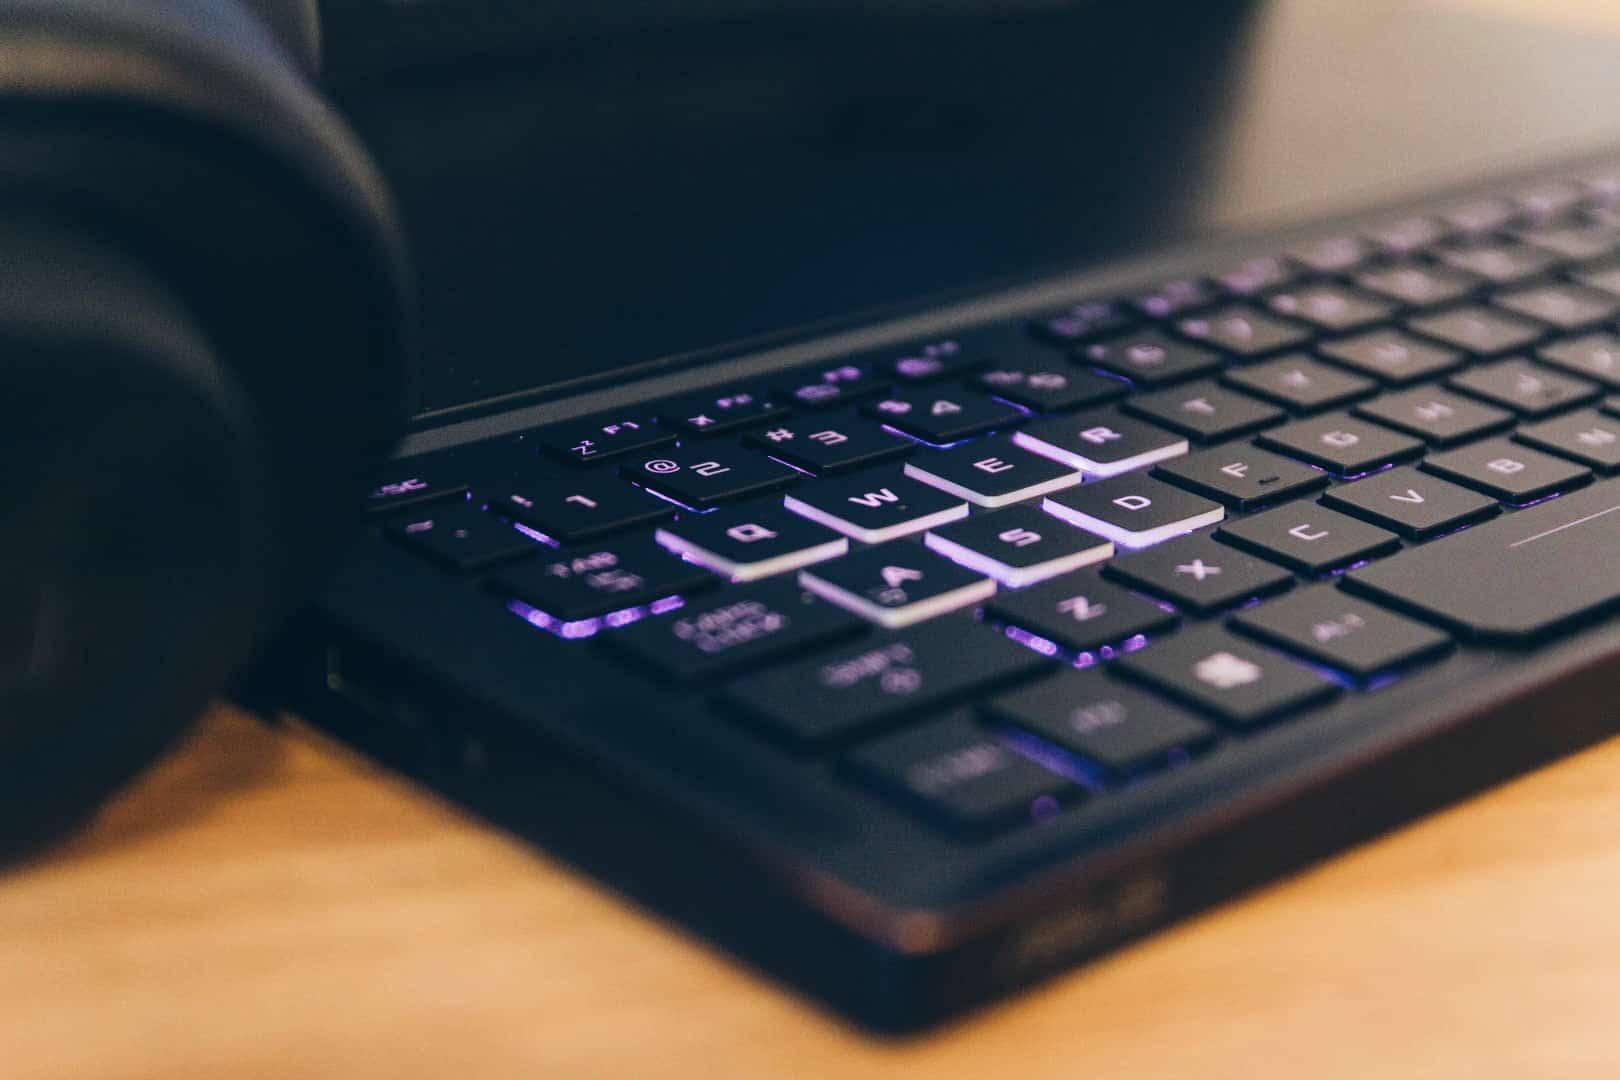 asus rog zephyrus gx501 keyboard button